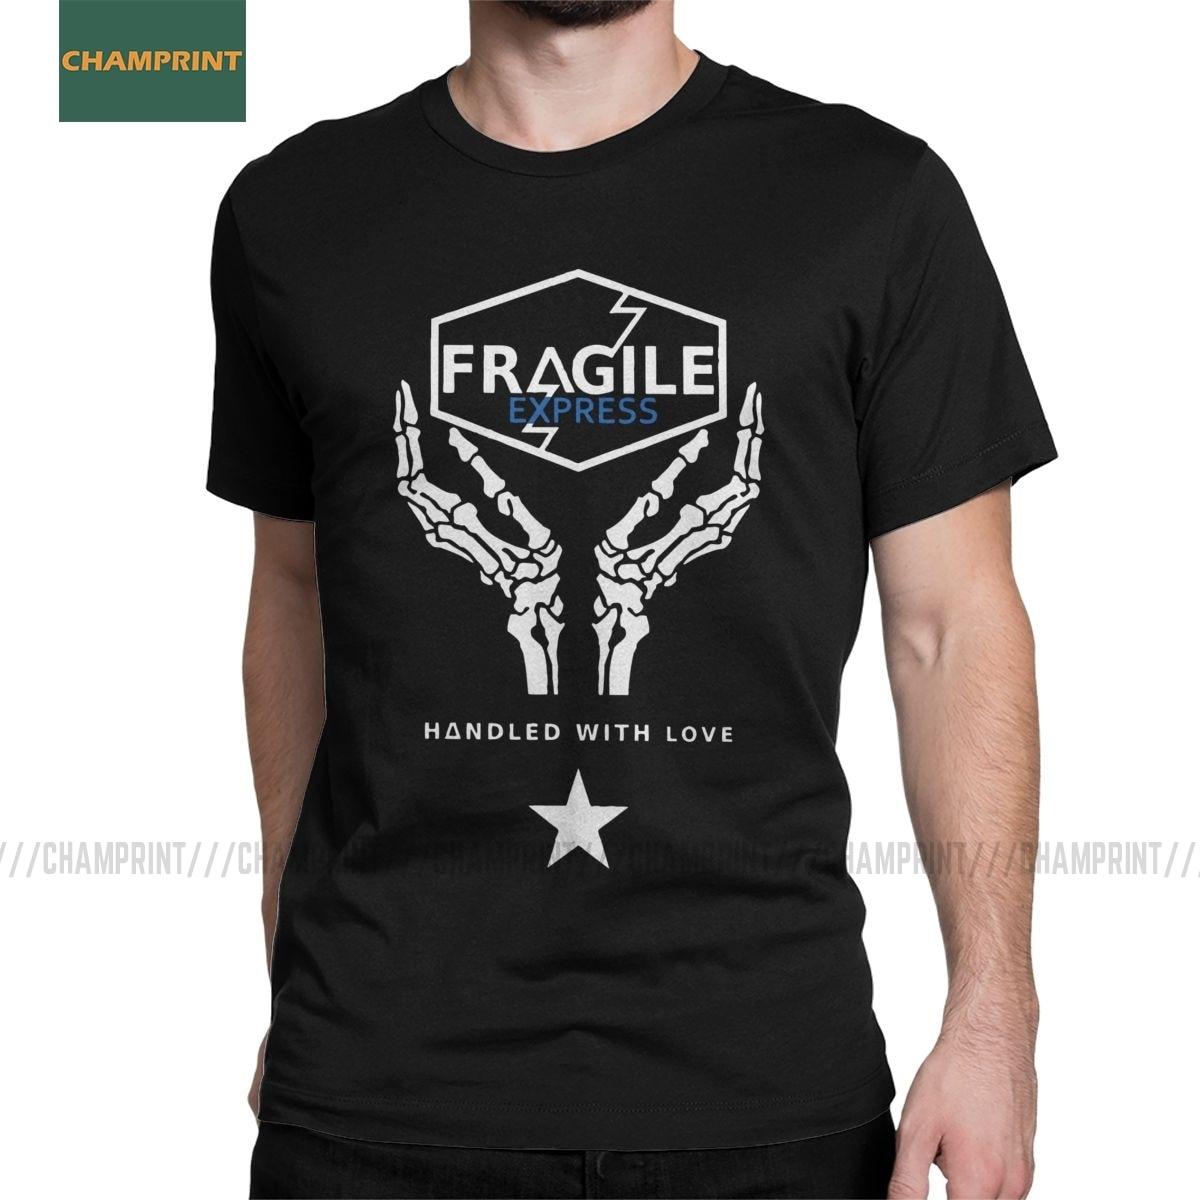 Fragile Express Death Stranding Men T Shirts Kojima Hideo Metal Gear Solid Reedus Norman Game Tees Short Sleeve T-Shirt Cotton